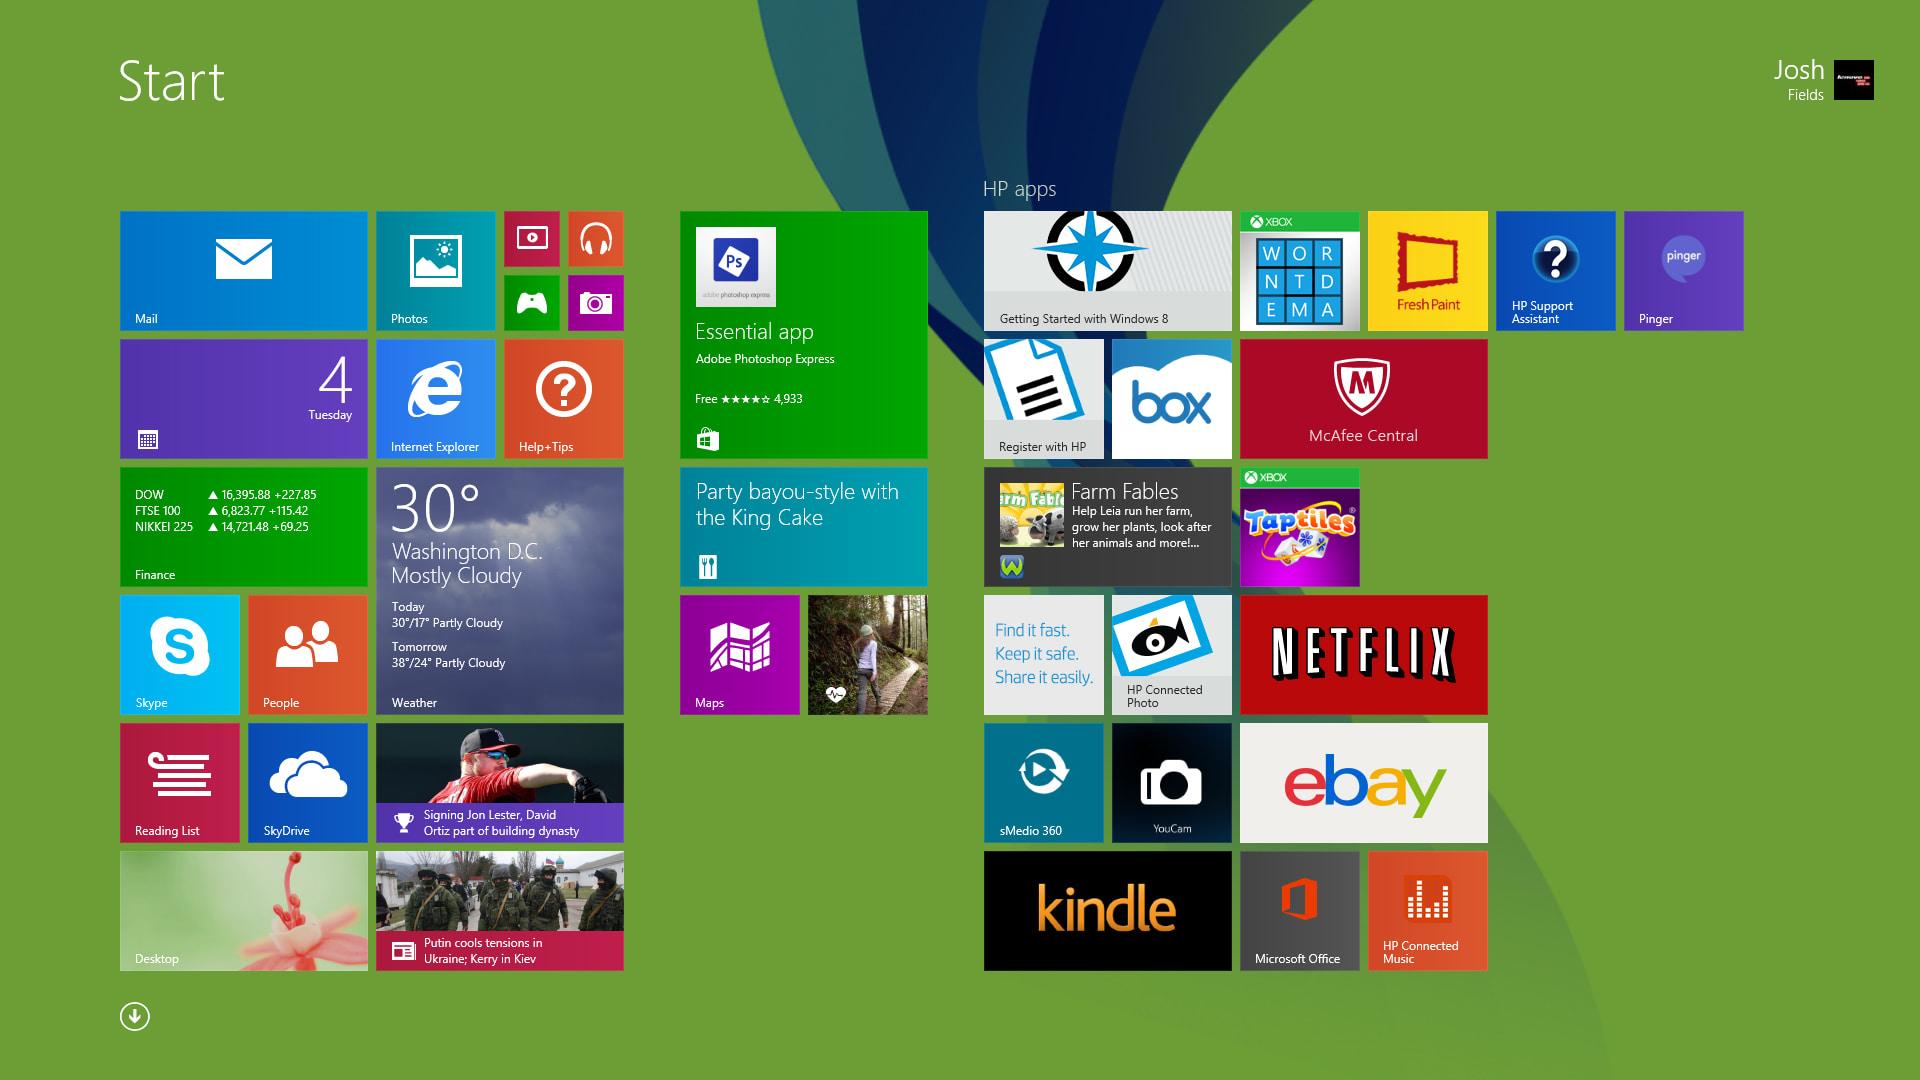 The HP Envy TouchSmart 17's Start screen